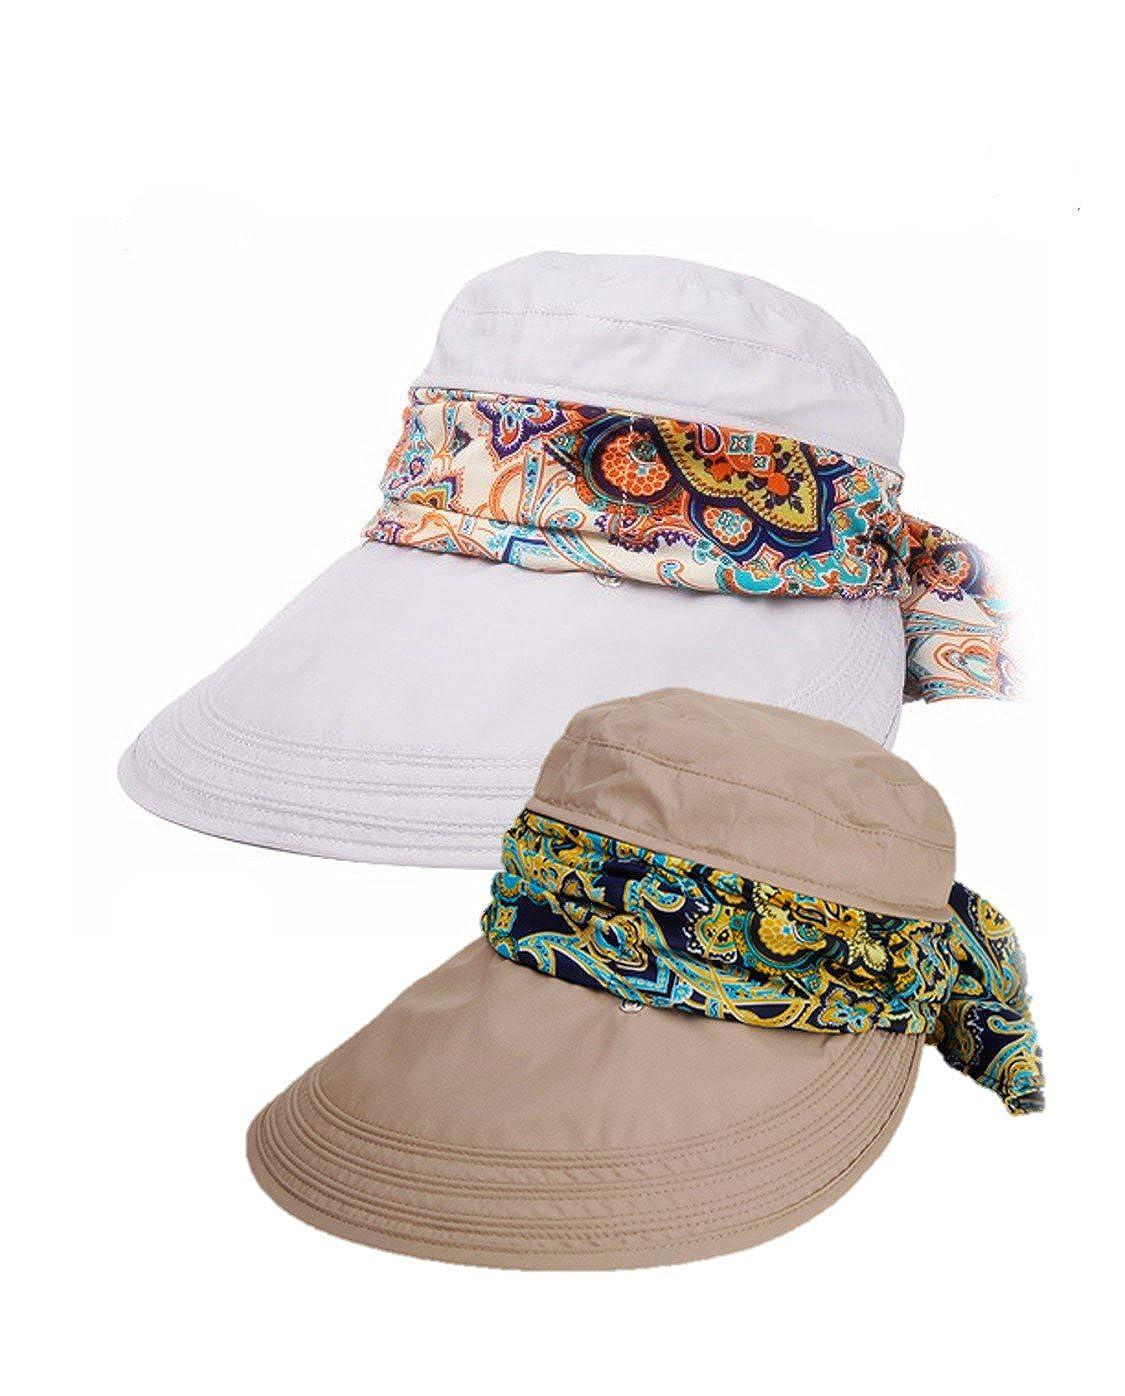 Roll Up Wide Brim Sun Visor UPF 50+ Protección UV Sun Hat con protector de cuello iHomey-Sunhat